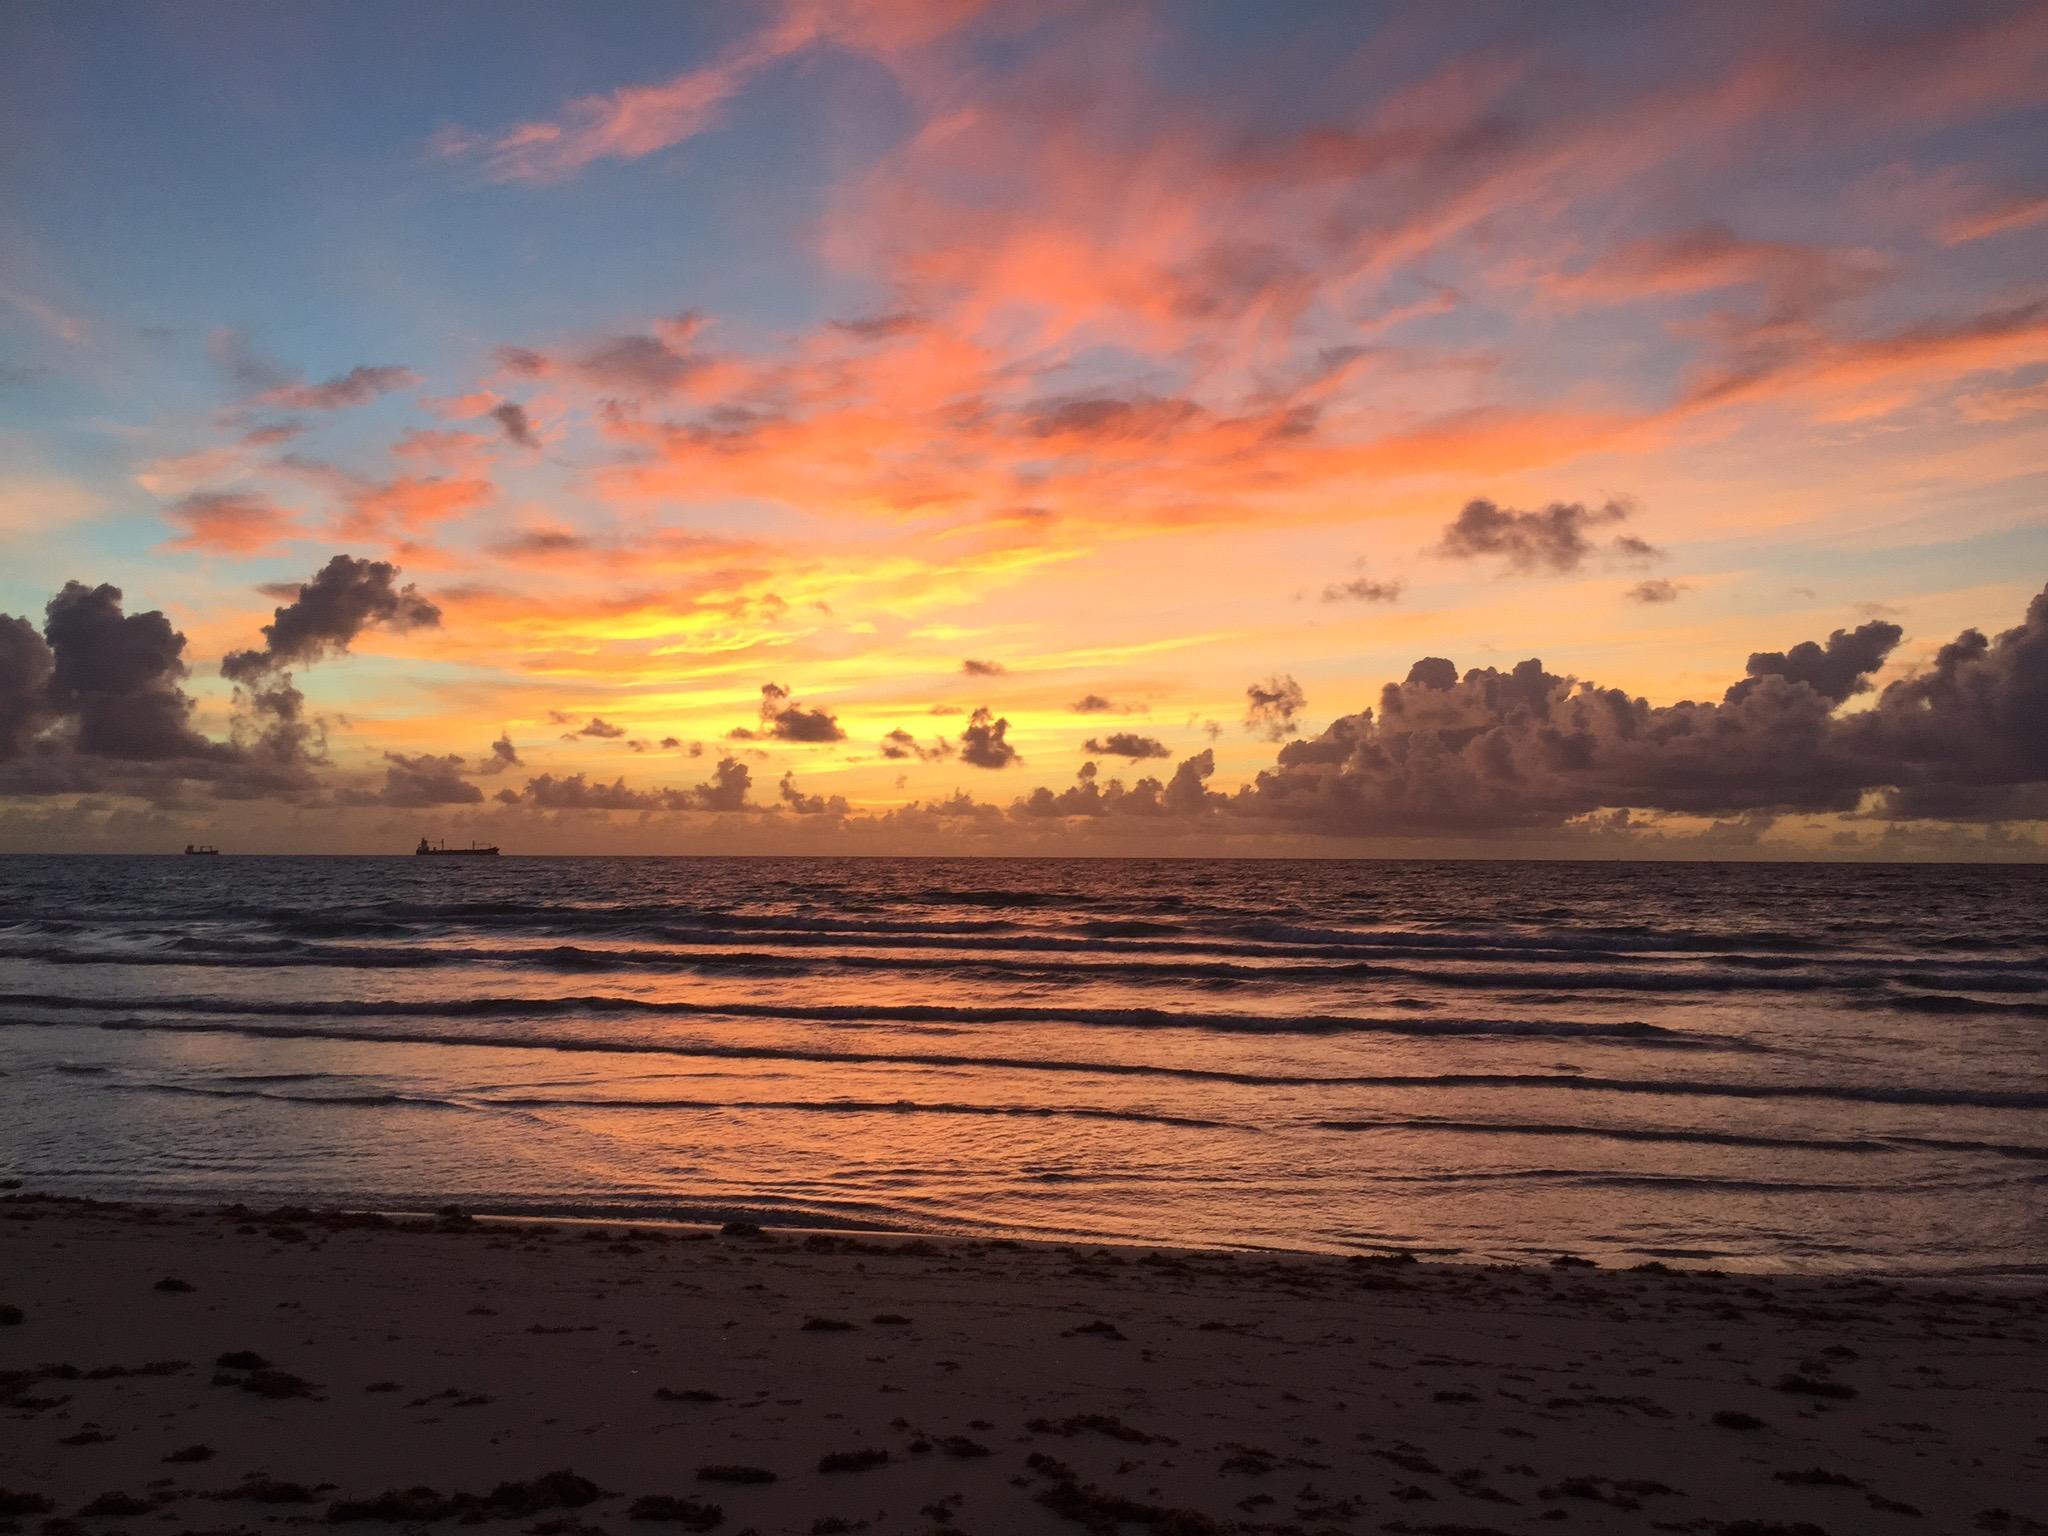 #MyPhotography | Miami Beach, Florida